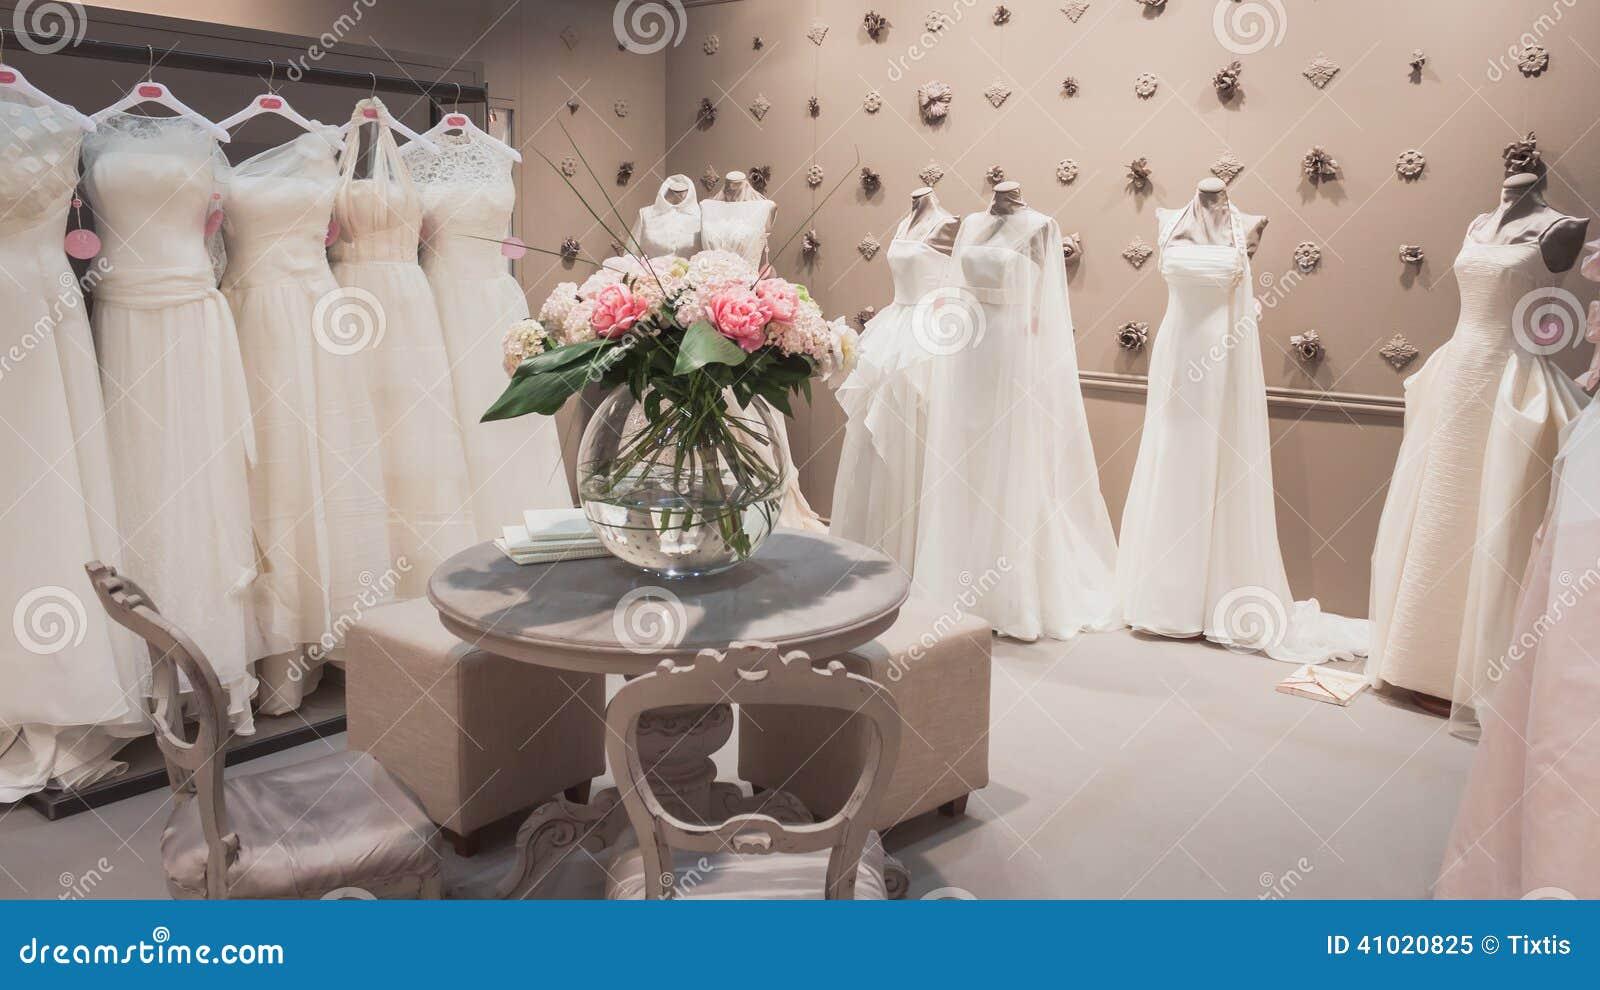 Wedding Dresses On Display At Si Sposaitalia In Milan